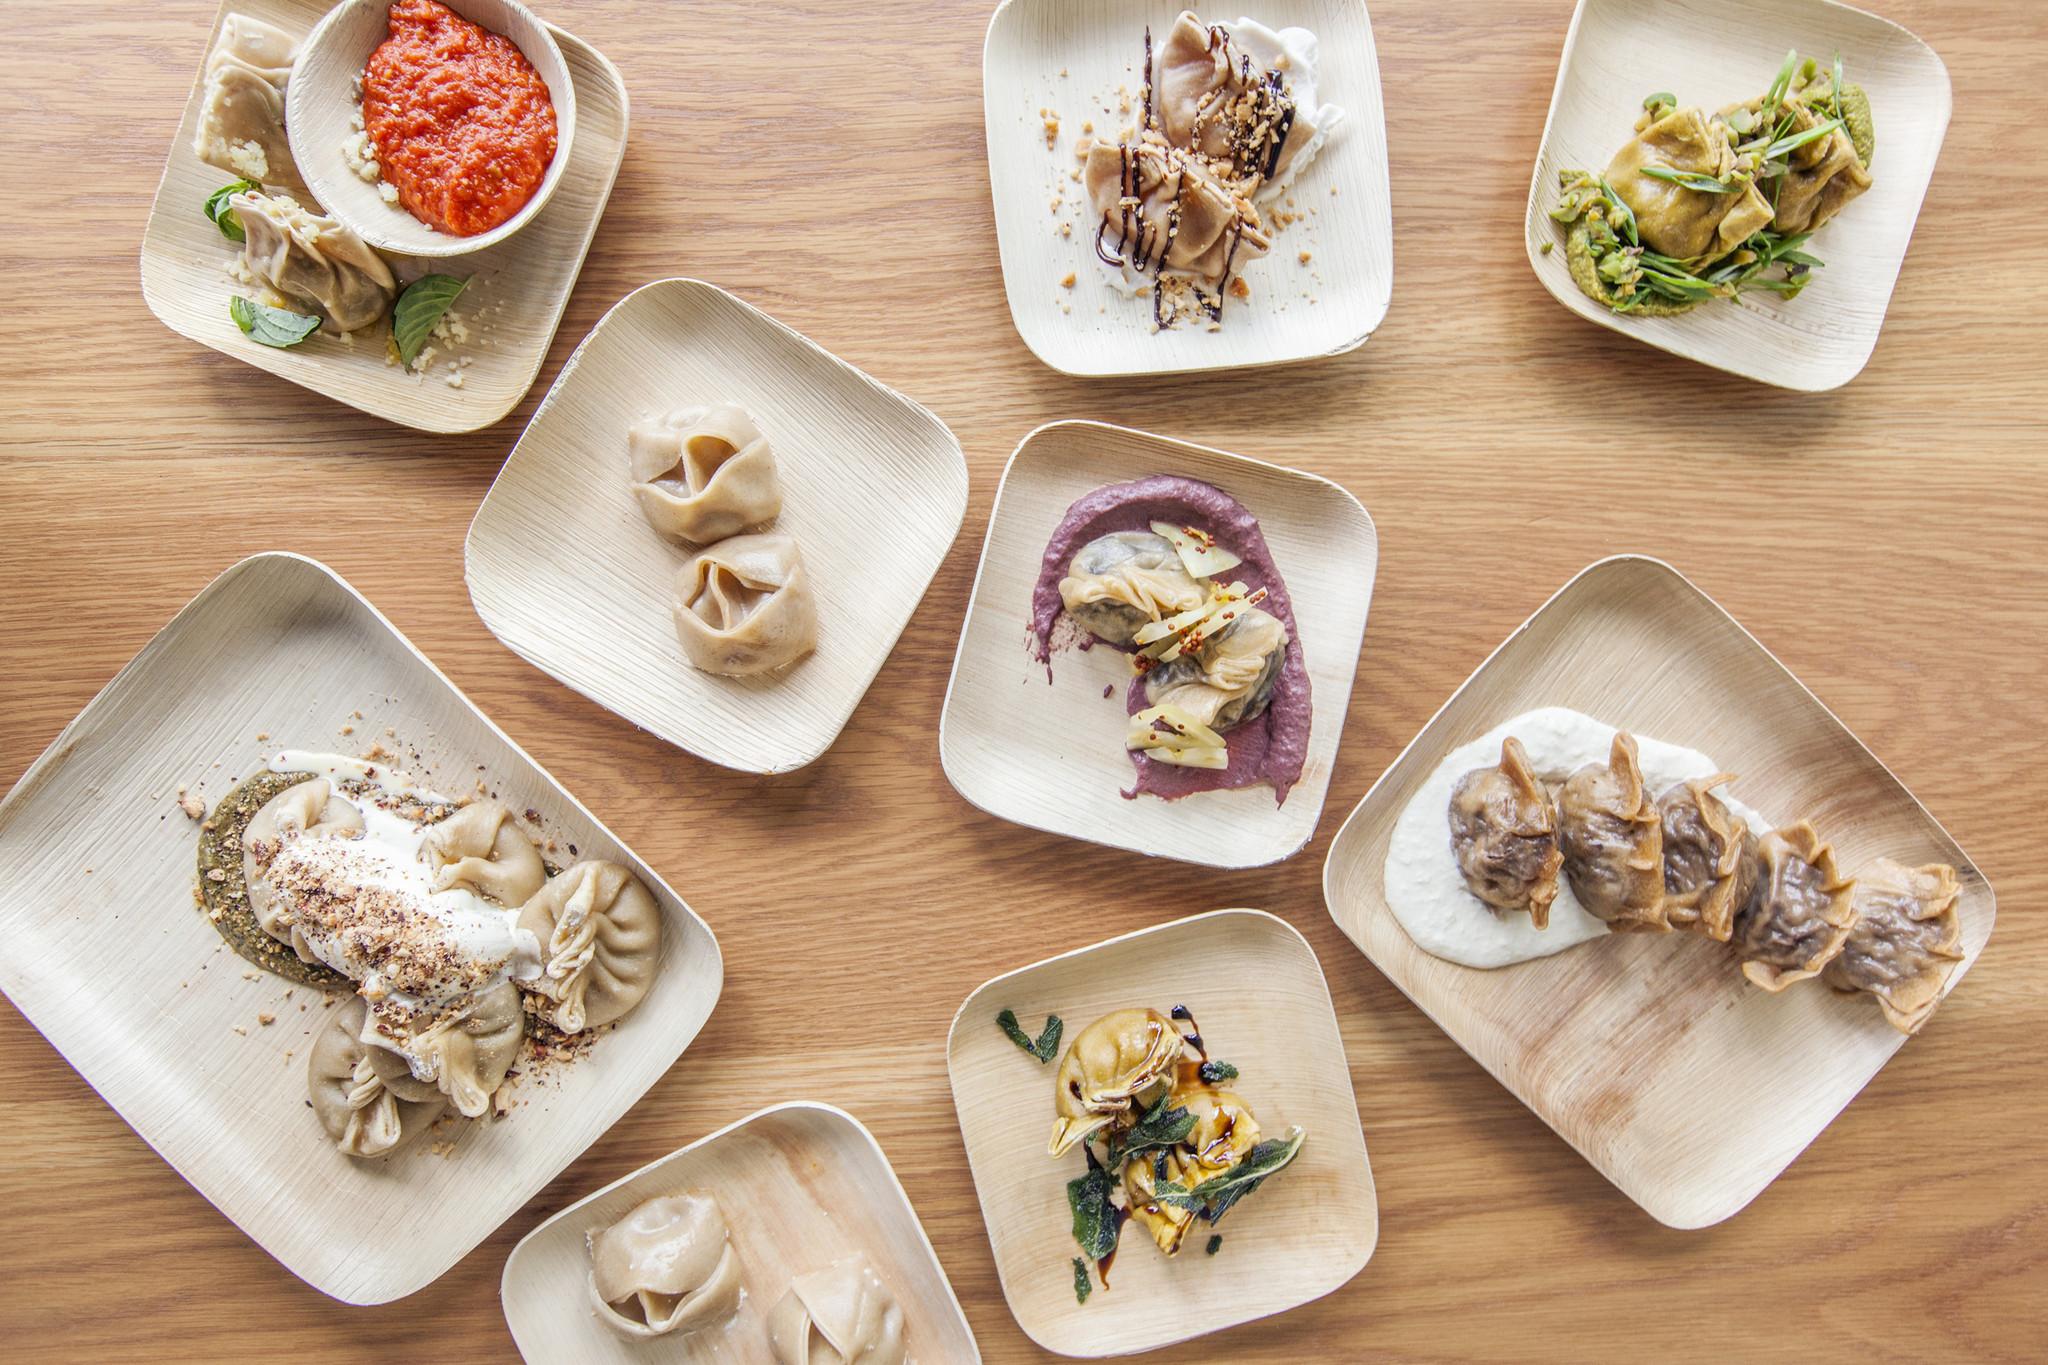 Meet hyde park 39 s new dumpling house packed everyblock for Everblock prix